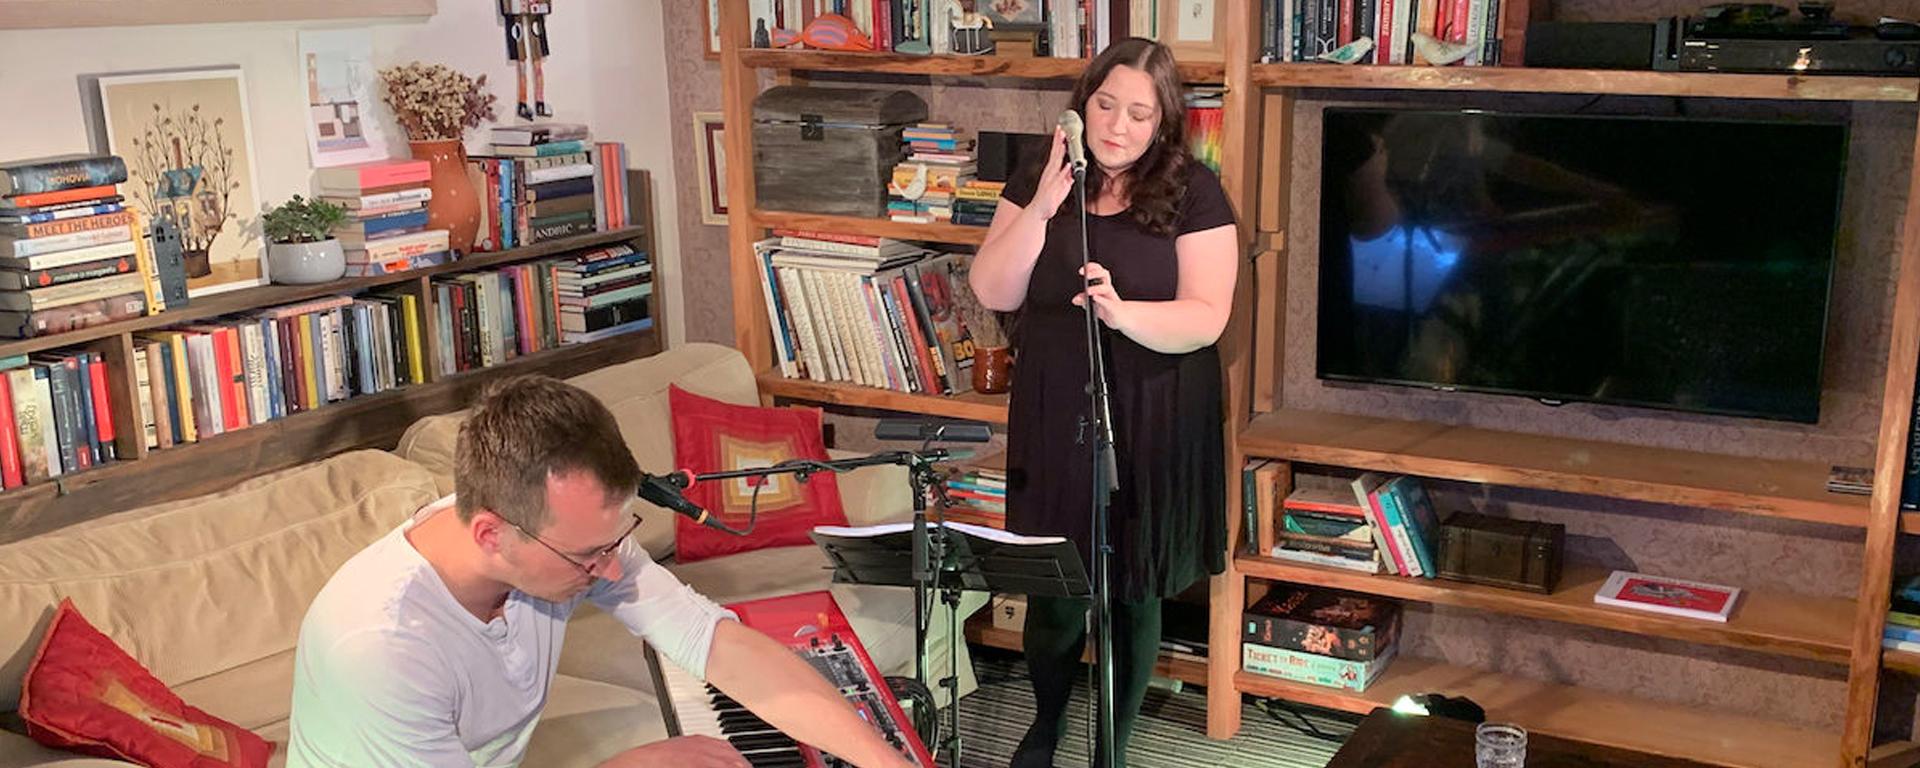 Katarína Koščová pozýva na koncert  do svojej obývačky.